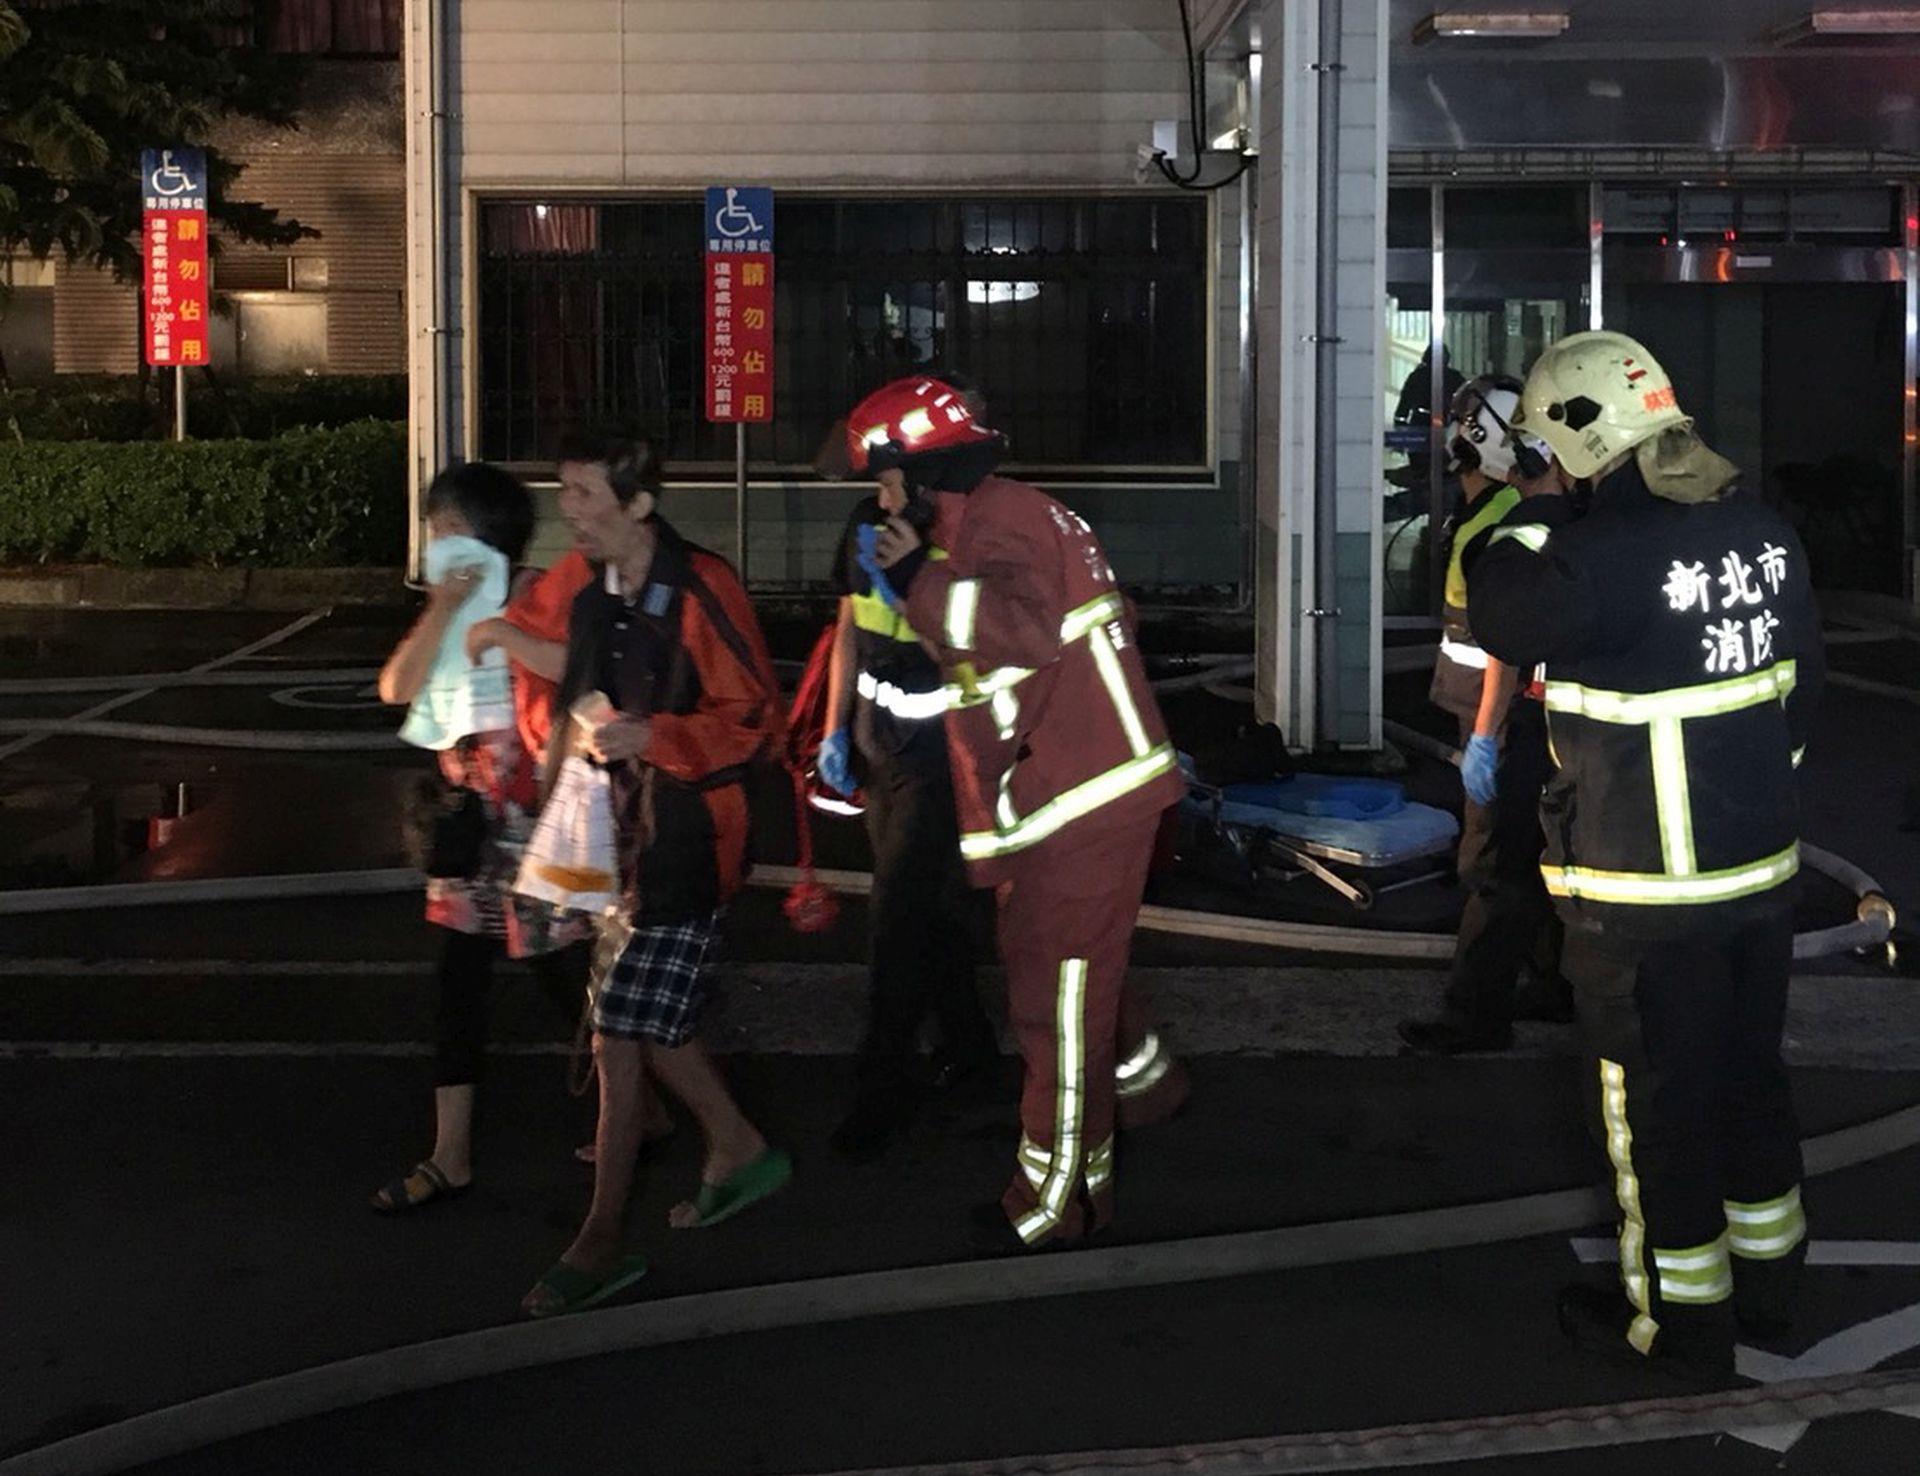 TAJVAN Devet ljudi smrtno stradalo u požaru u bolnici